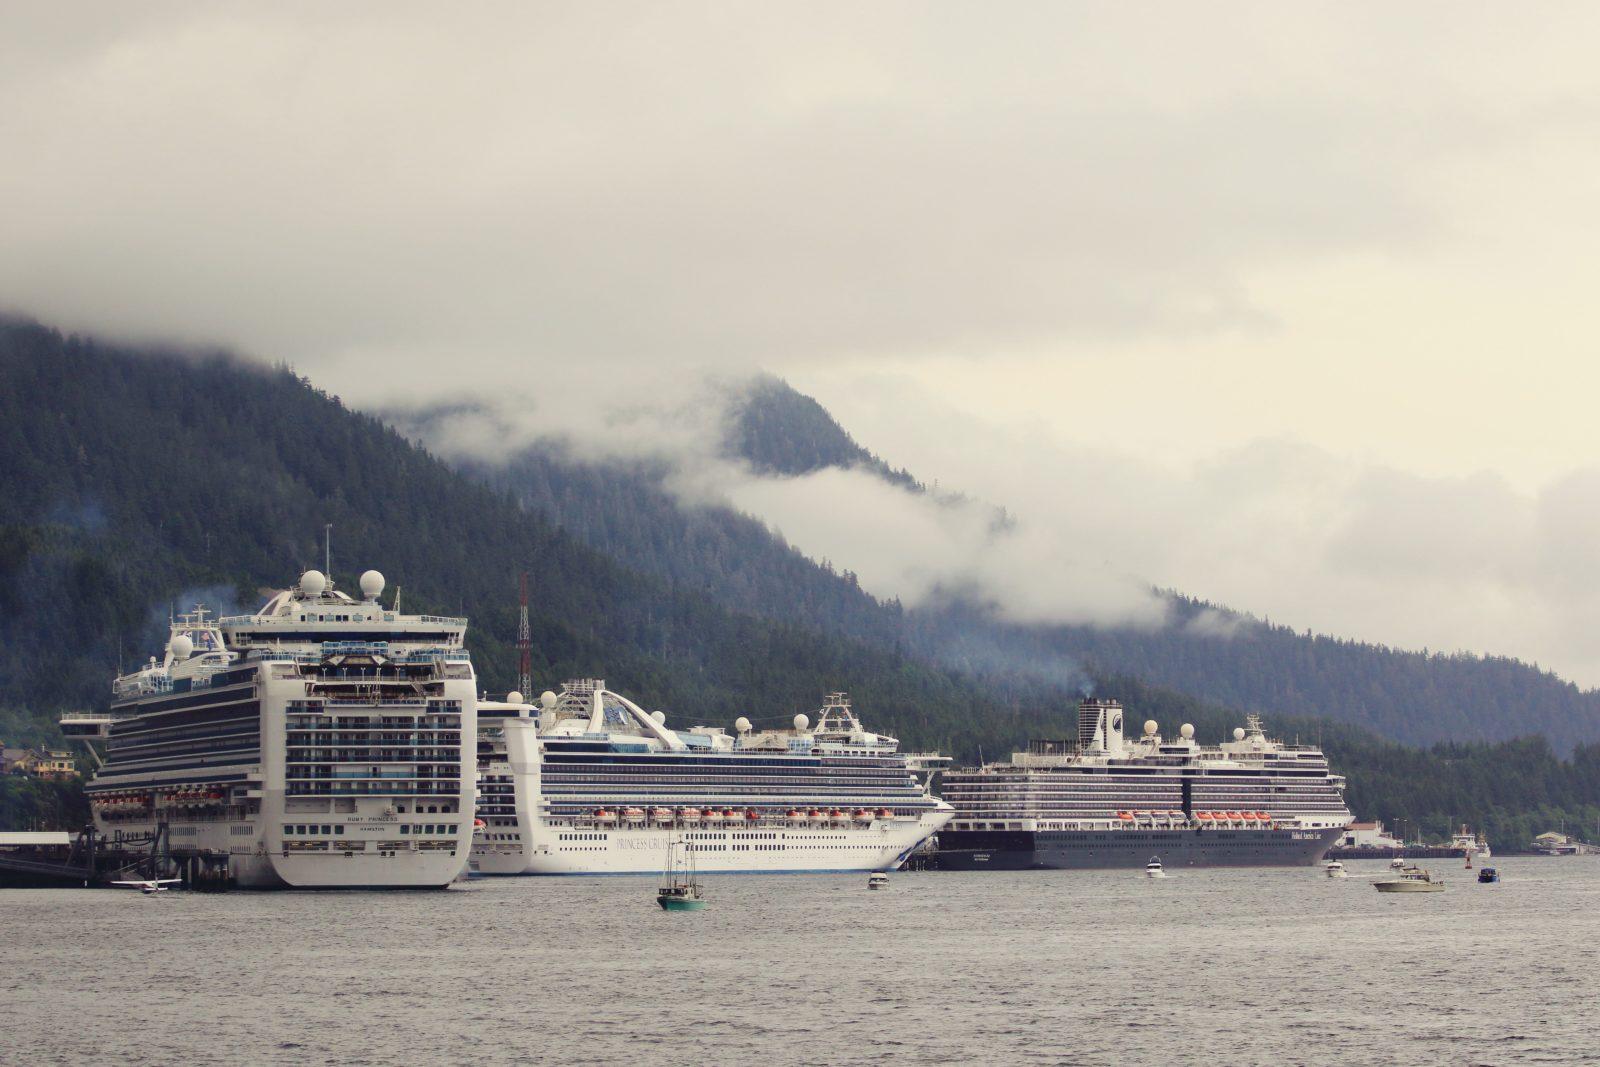 three cruise ships